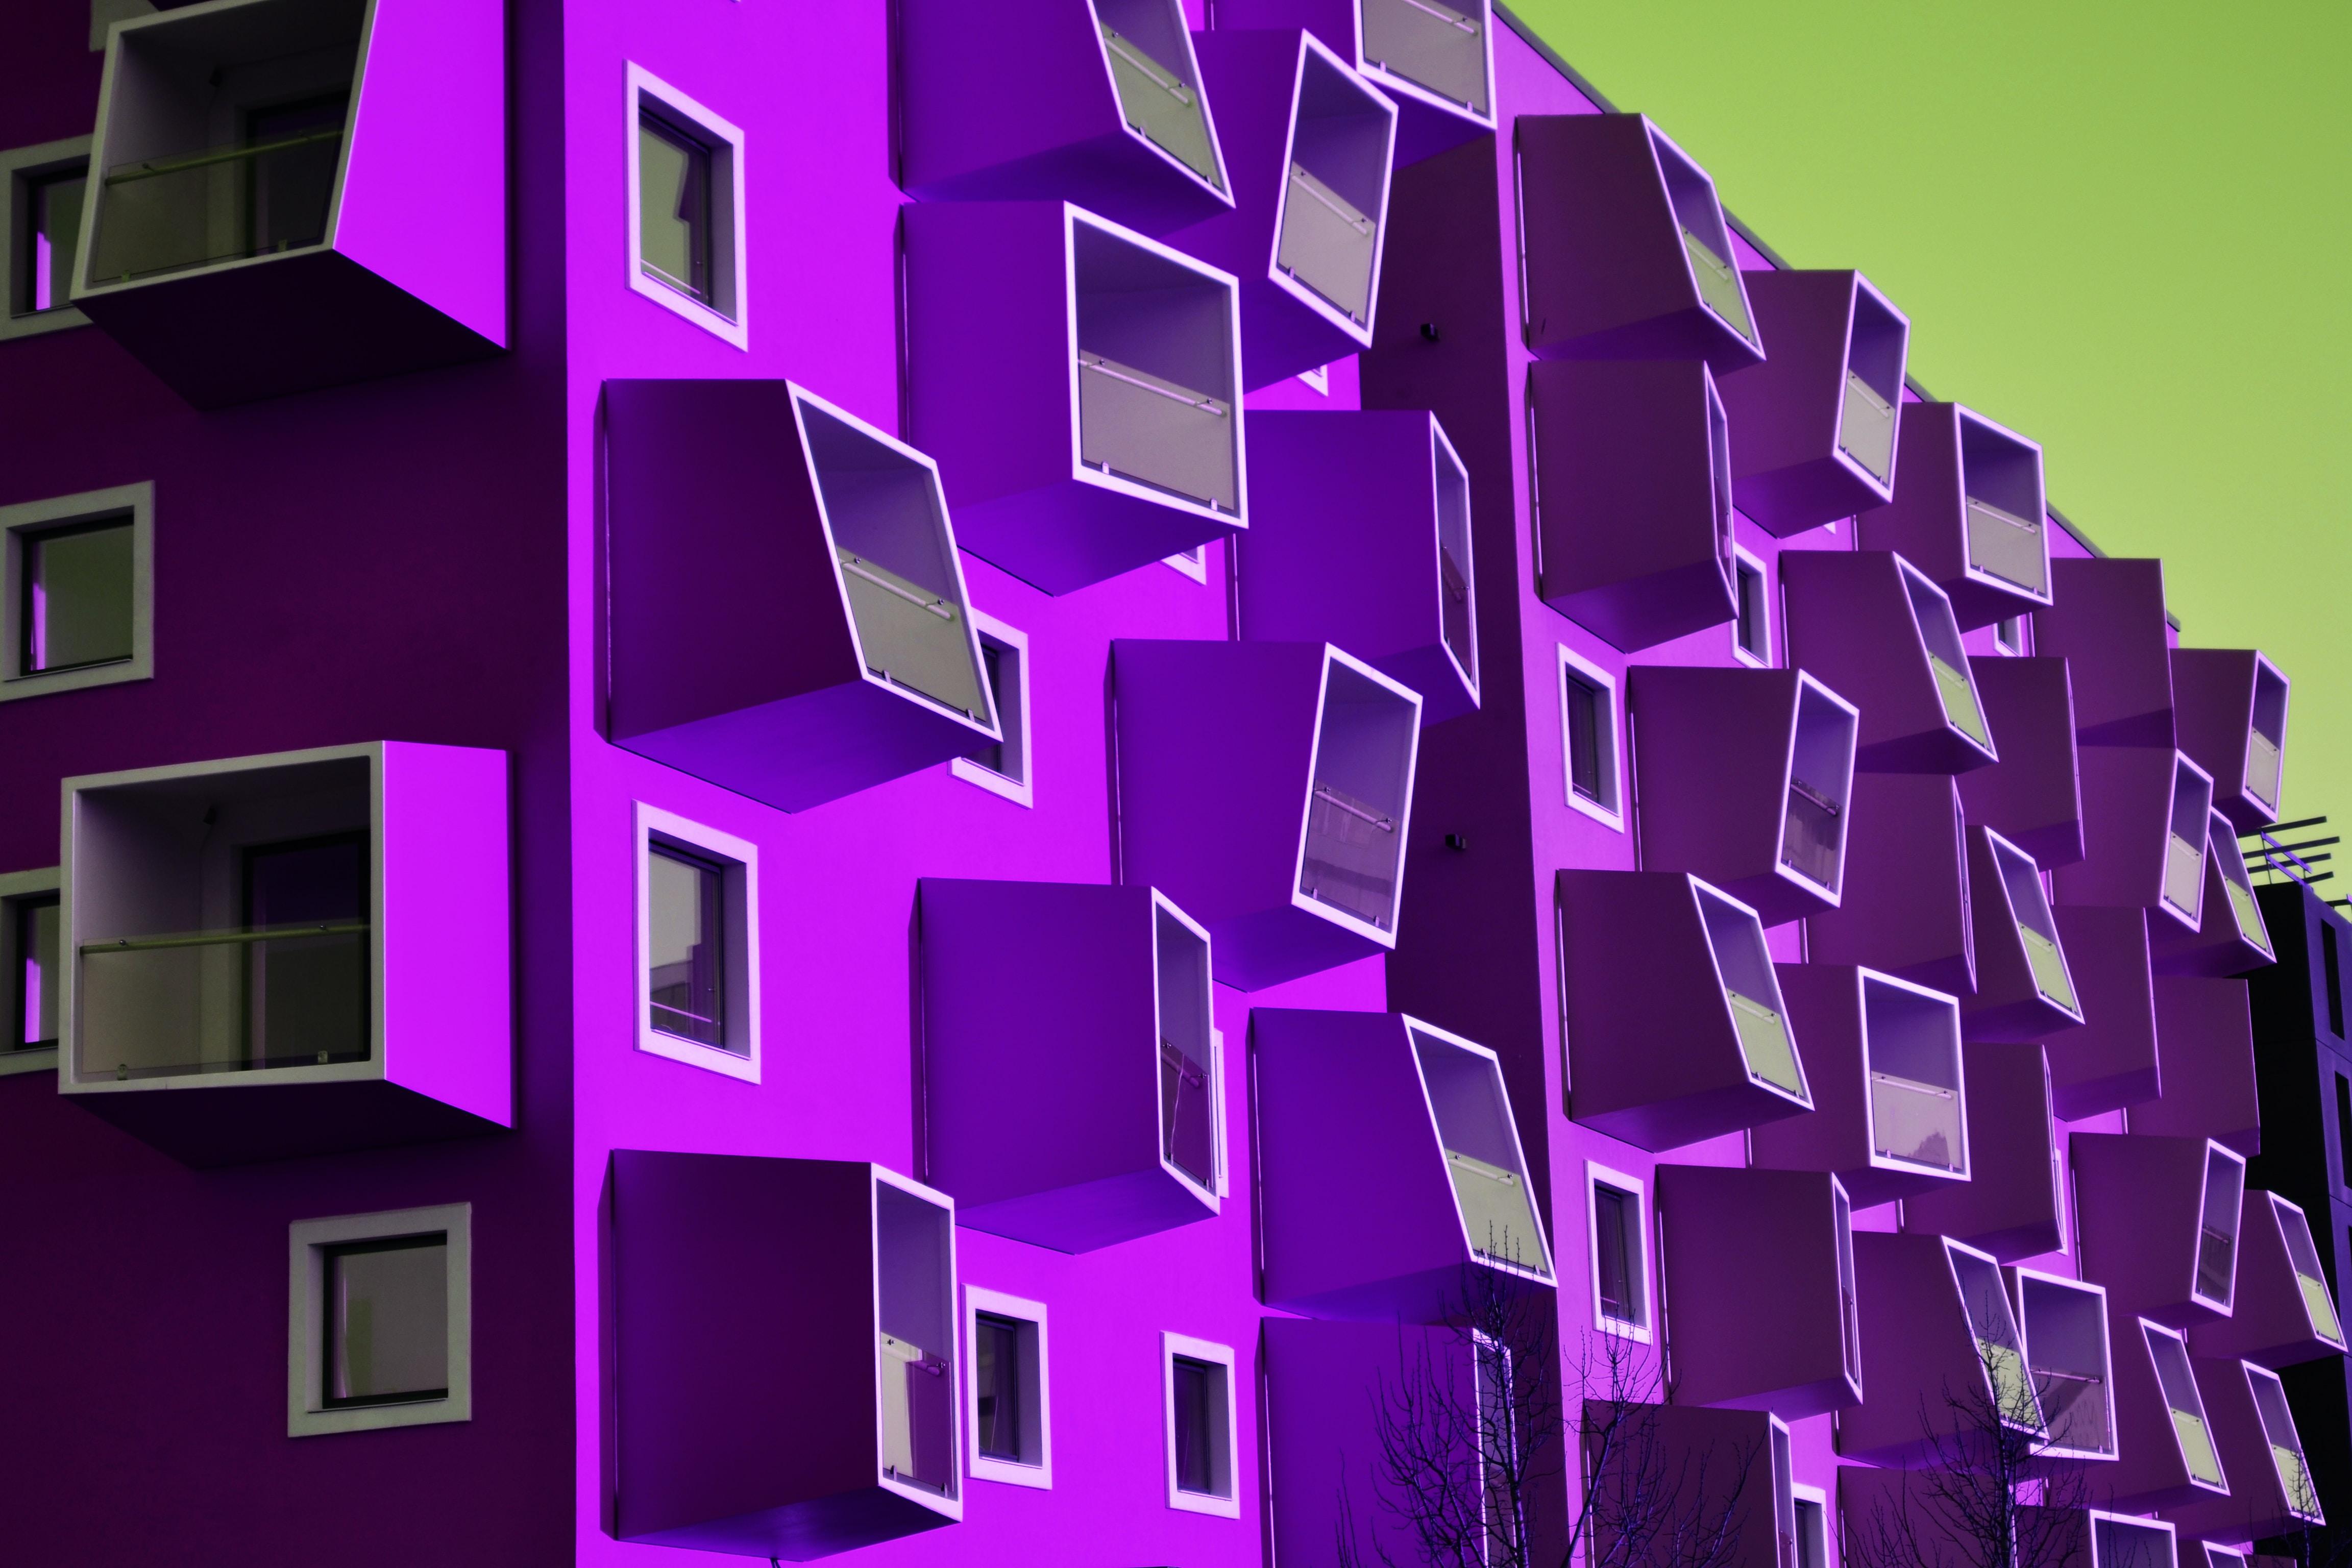 purple wooden building